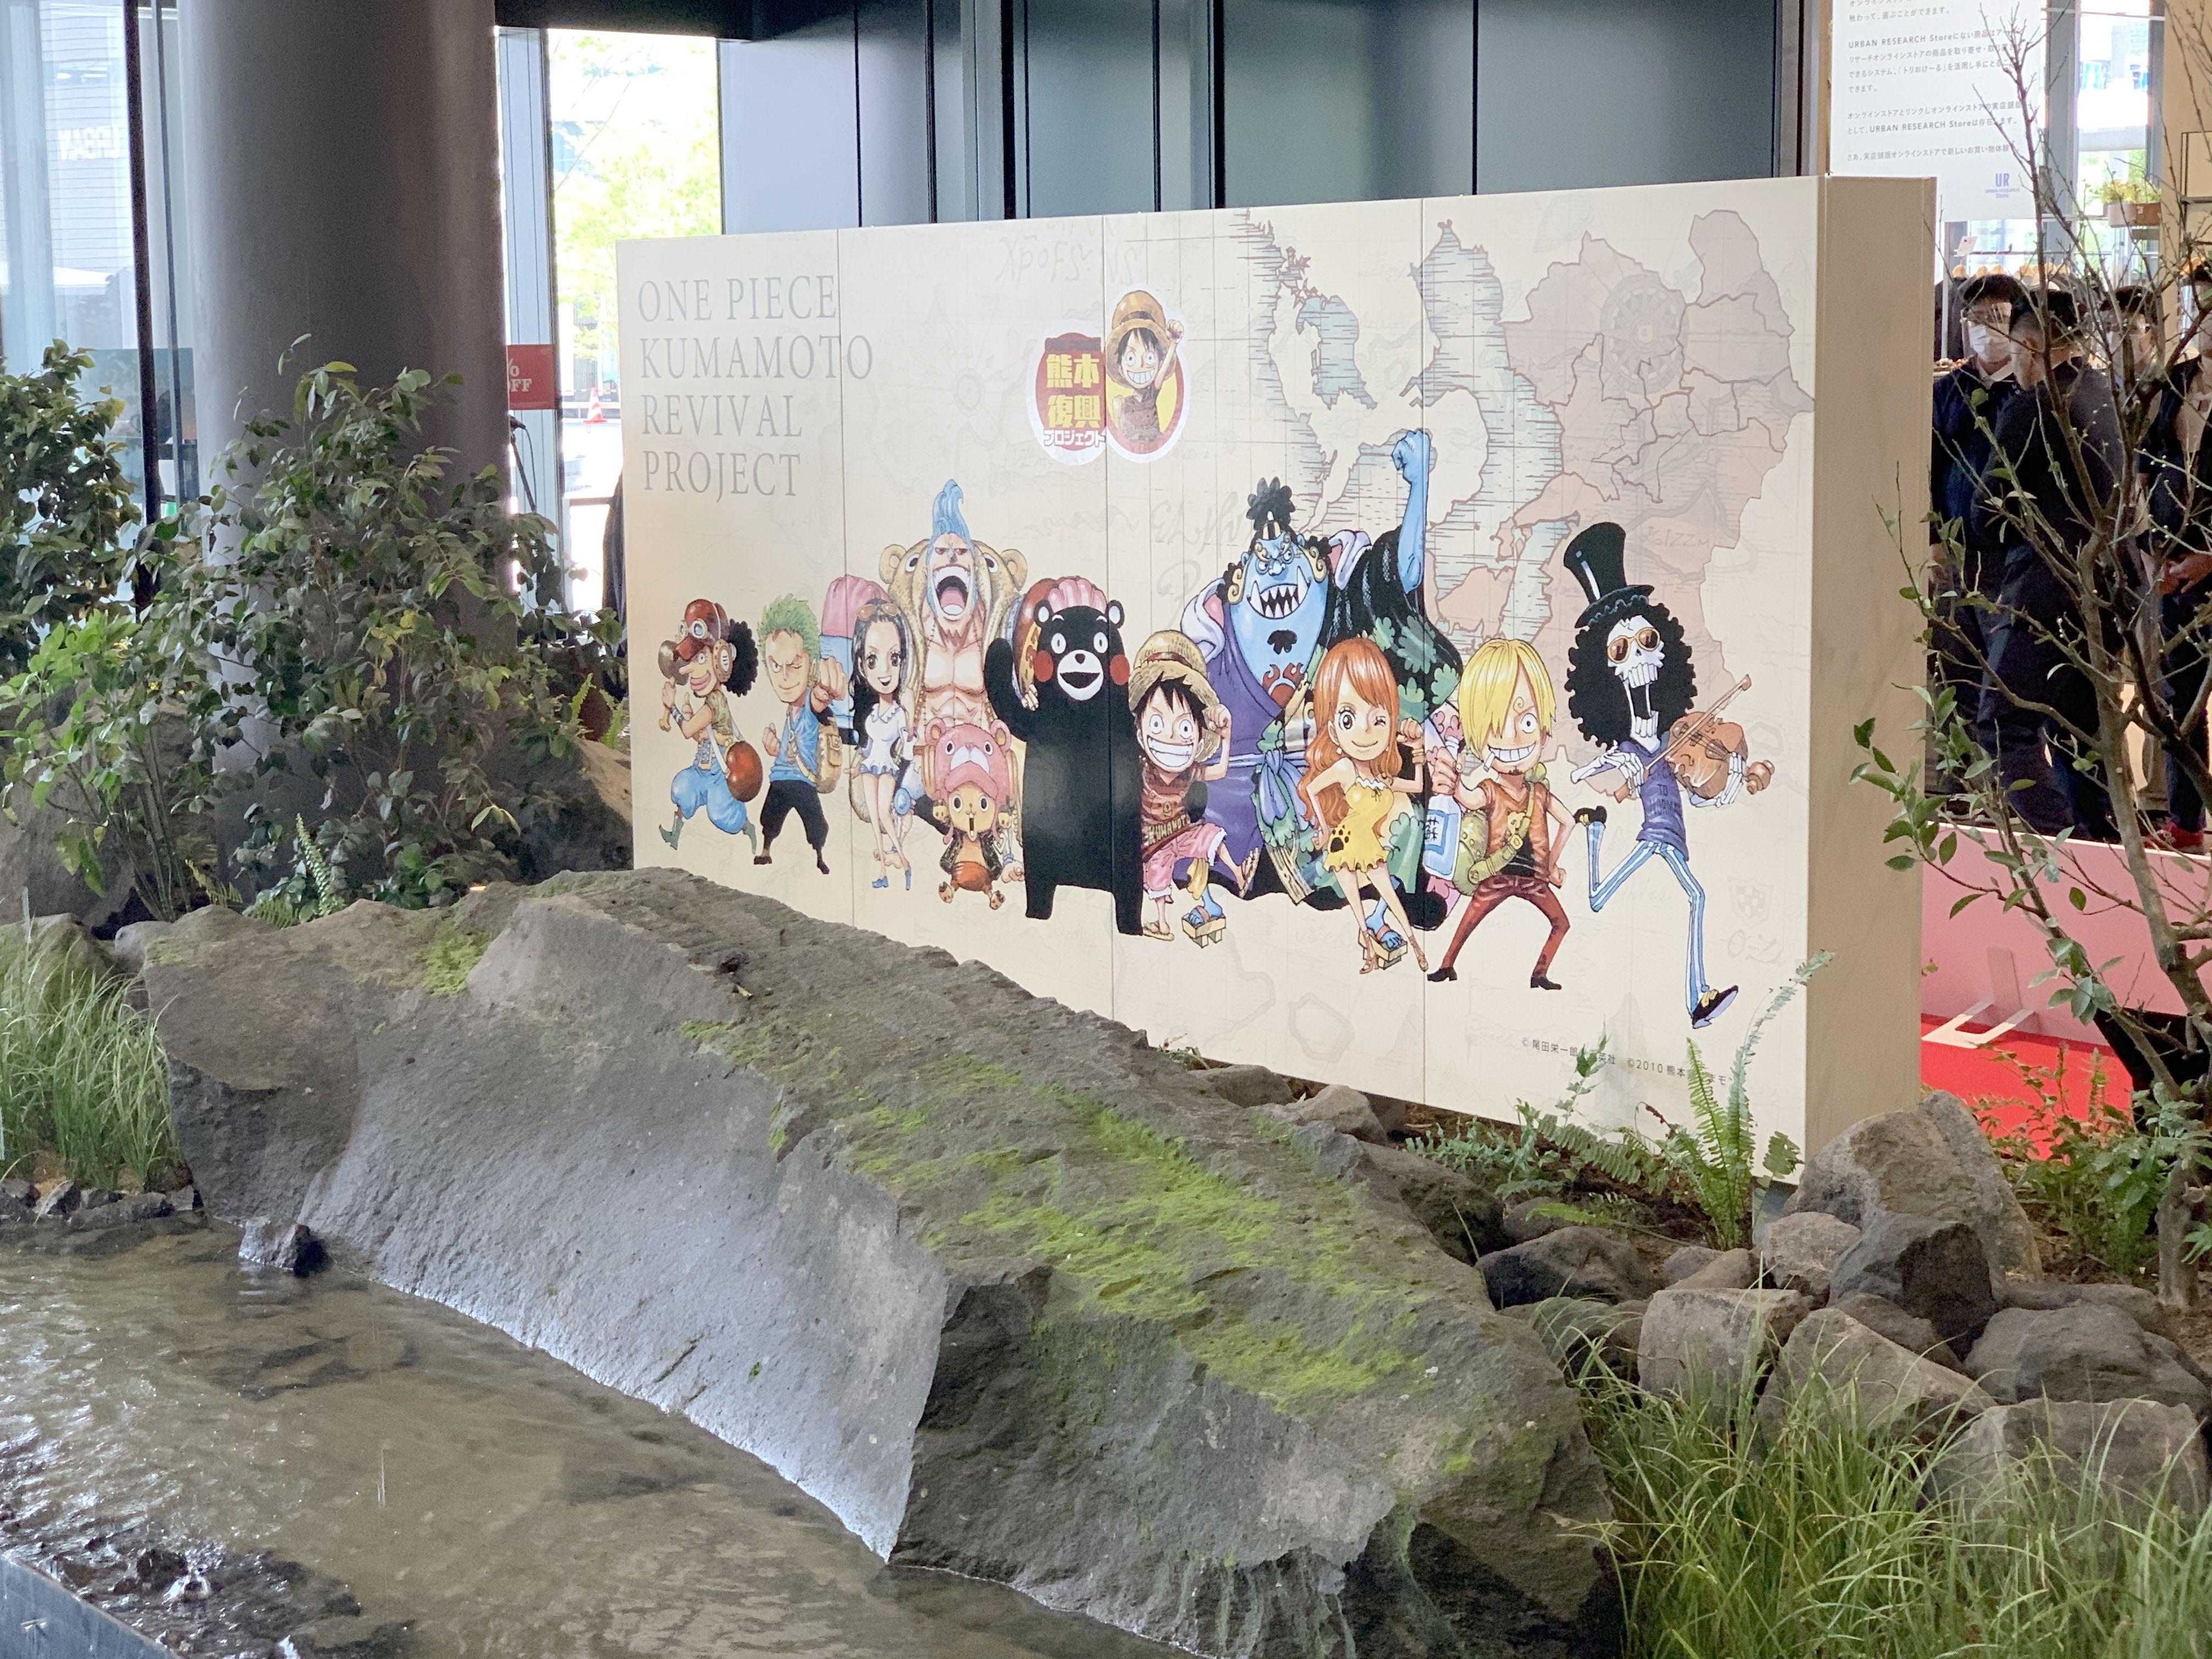 ONE PIECE熊本復興プロジェクト陶板がお目見え!